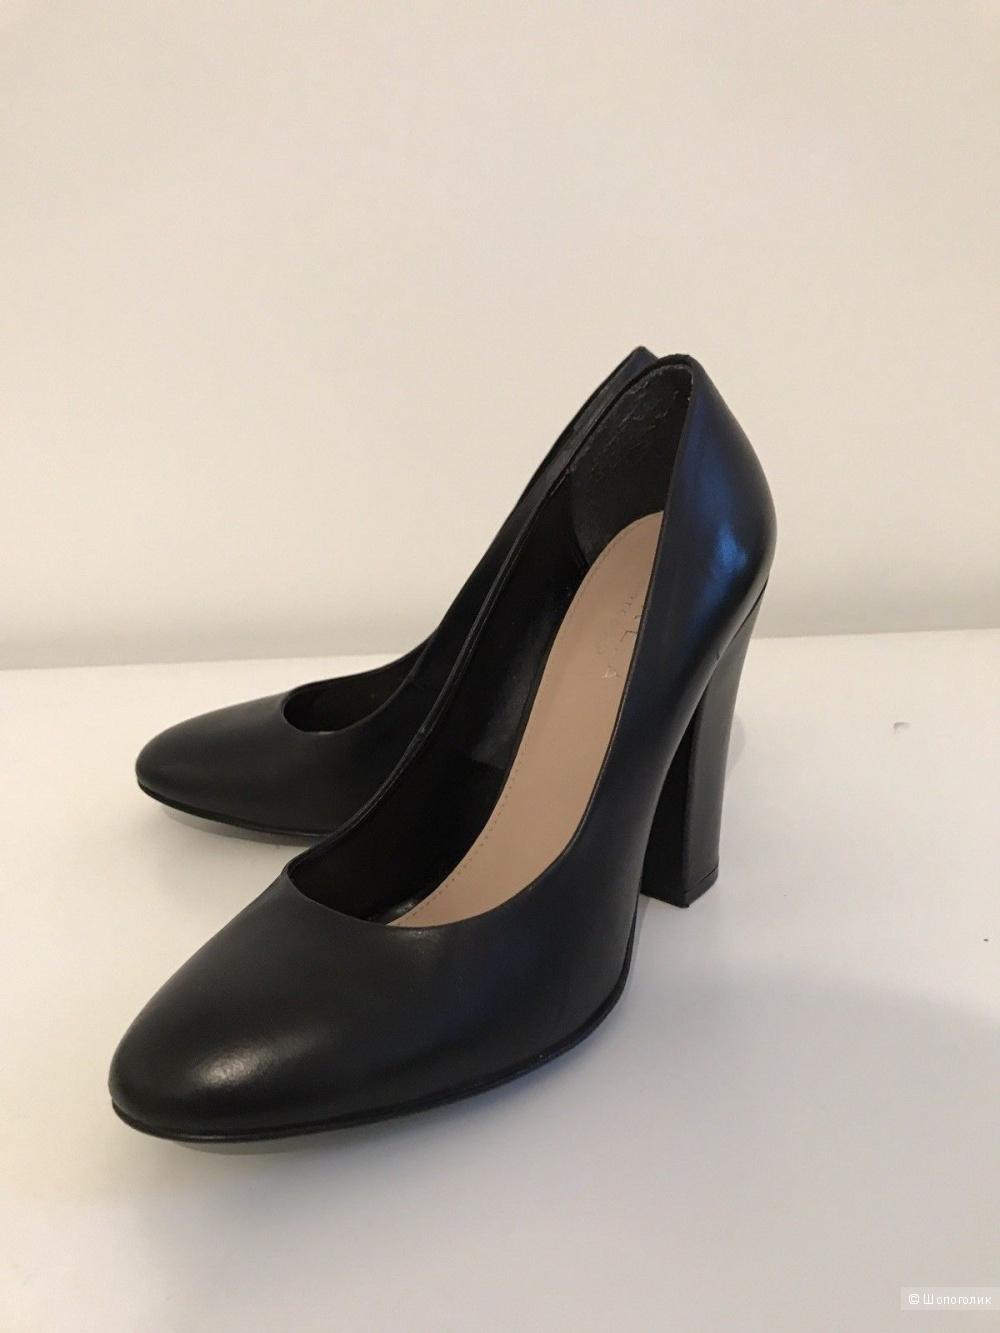 Kurt Geiger Carvela туфли размер 37